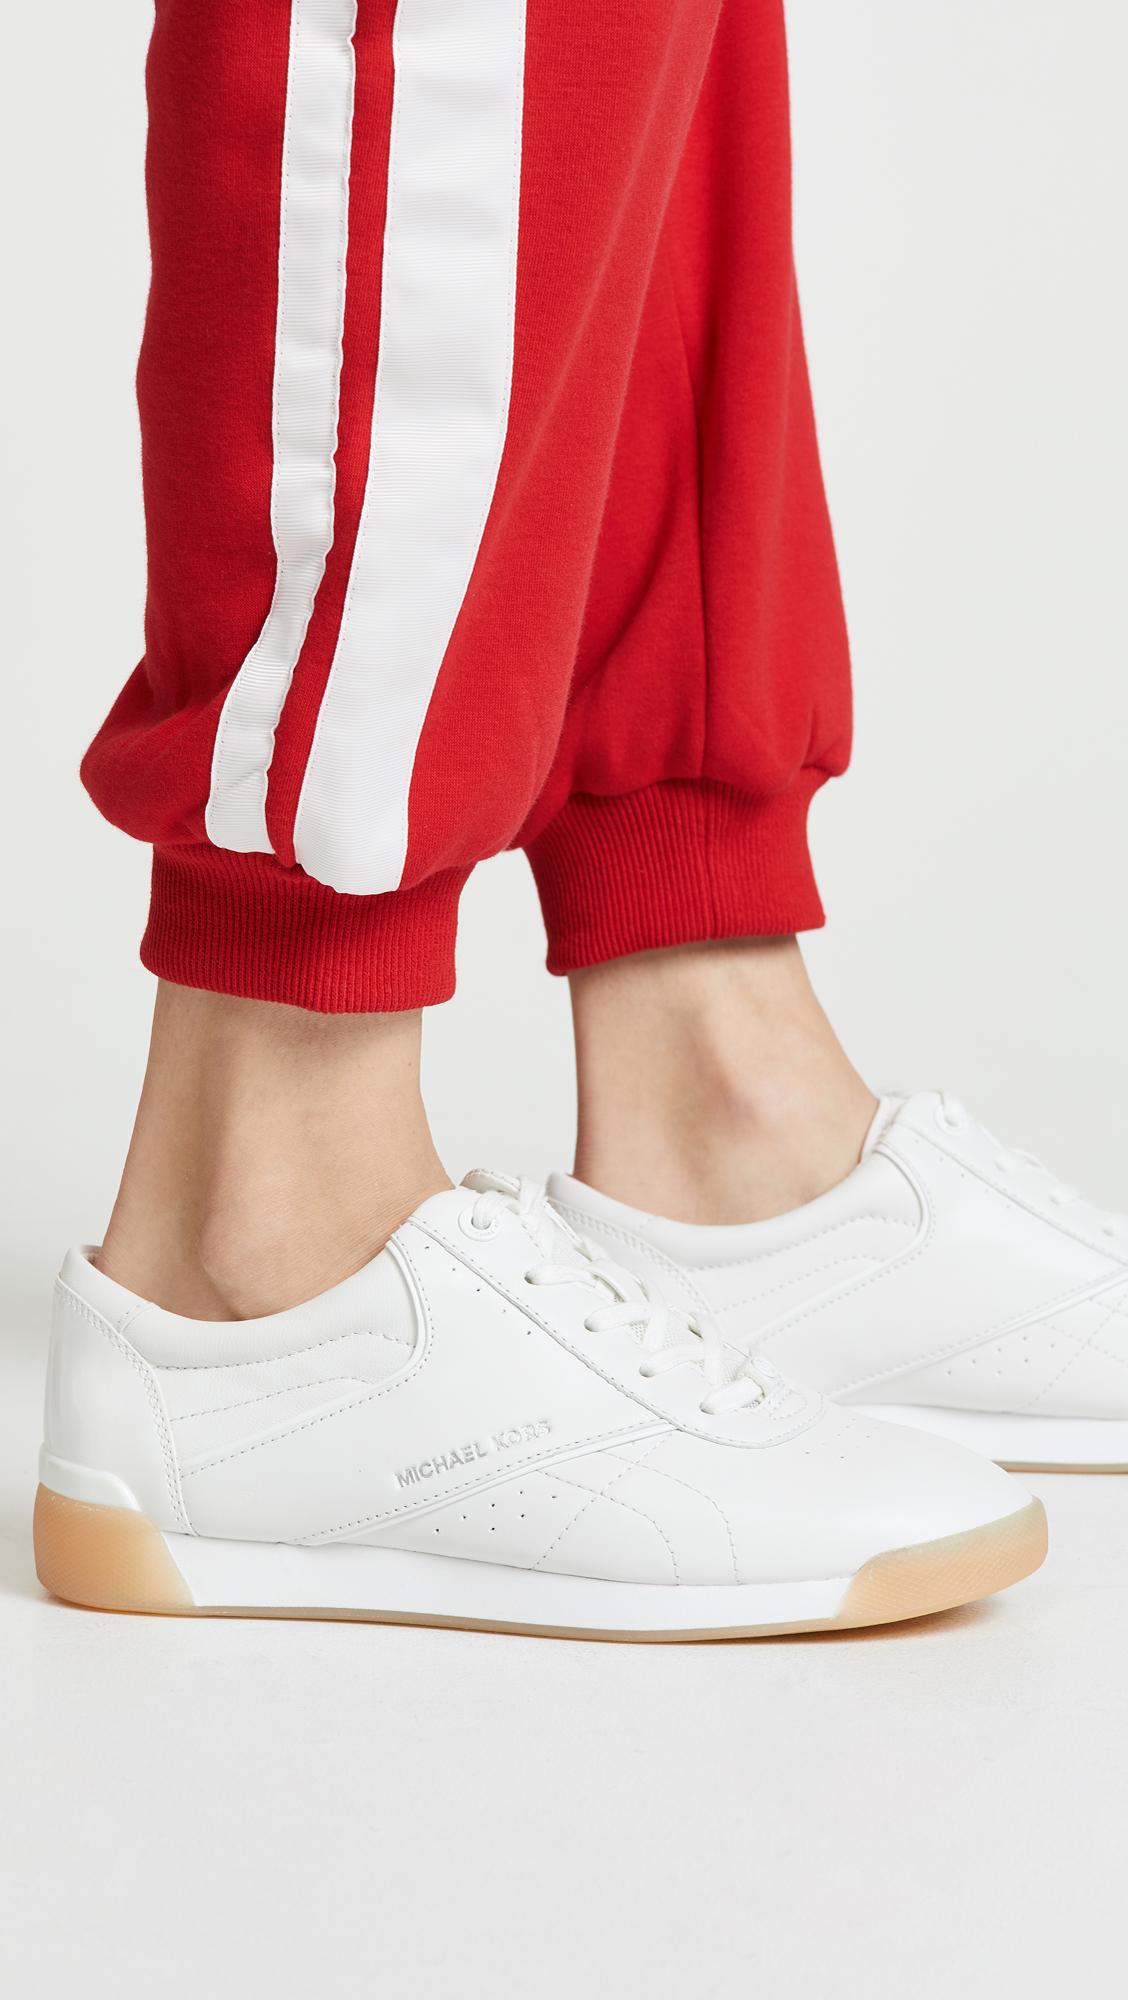 c66e758721 MICHAEL Michael Kors Addie Lace Up Sneakers   SHOPBOP